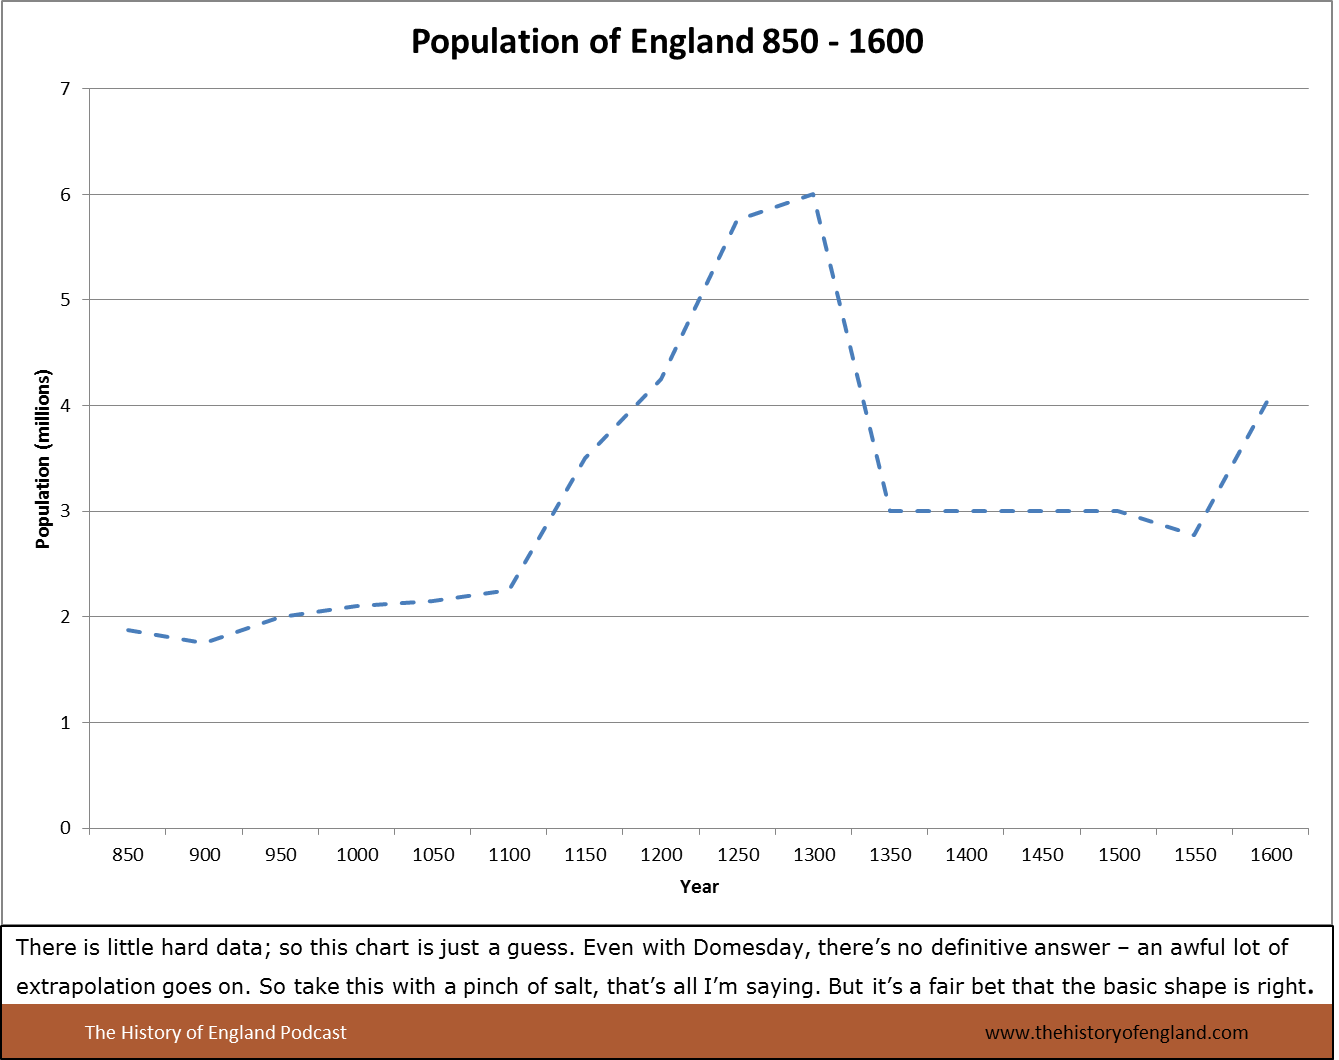 English population 850-1600